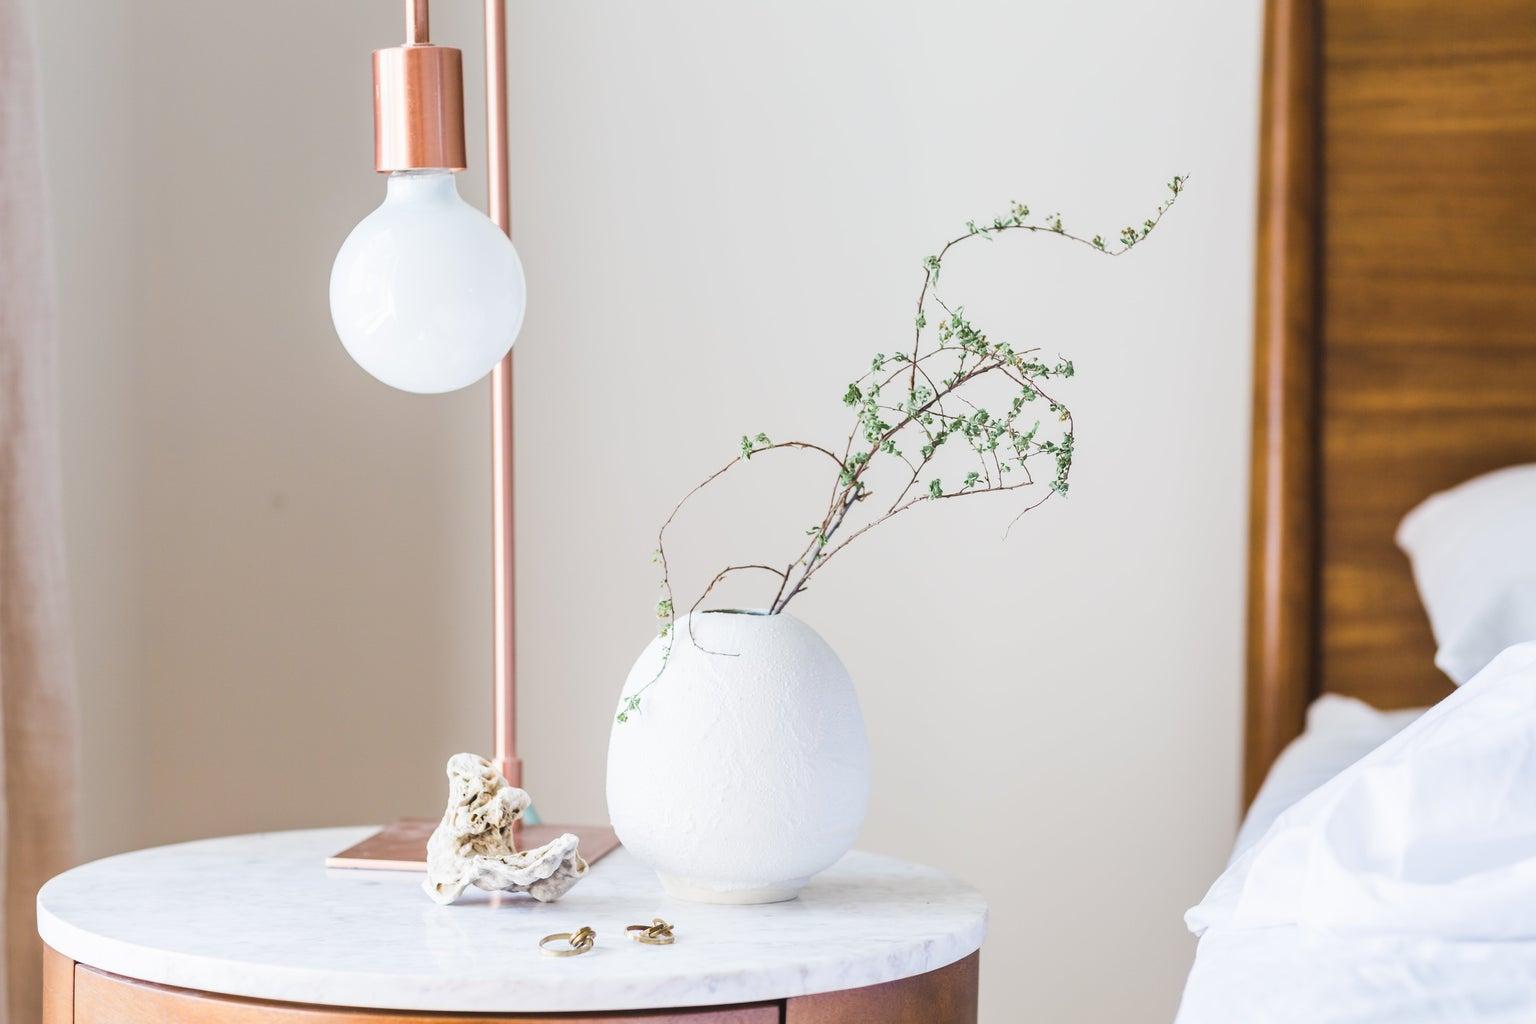 Bedroom Bulb Interior Decoration Lamp